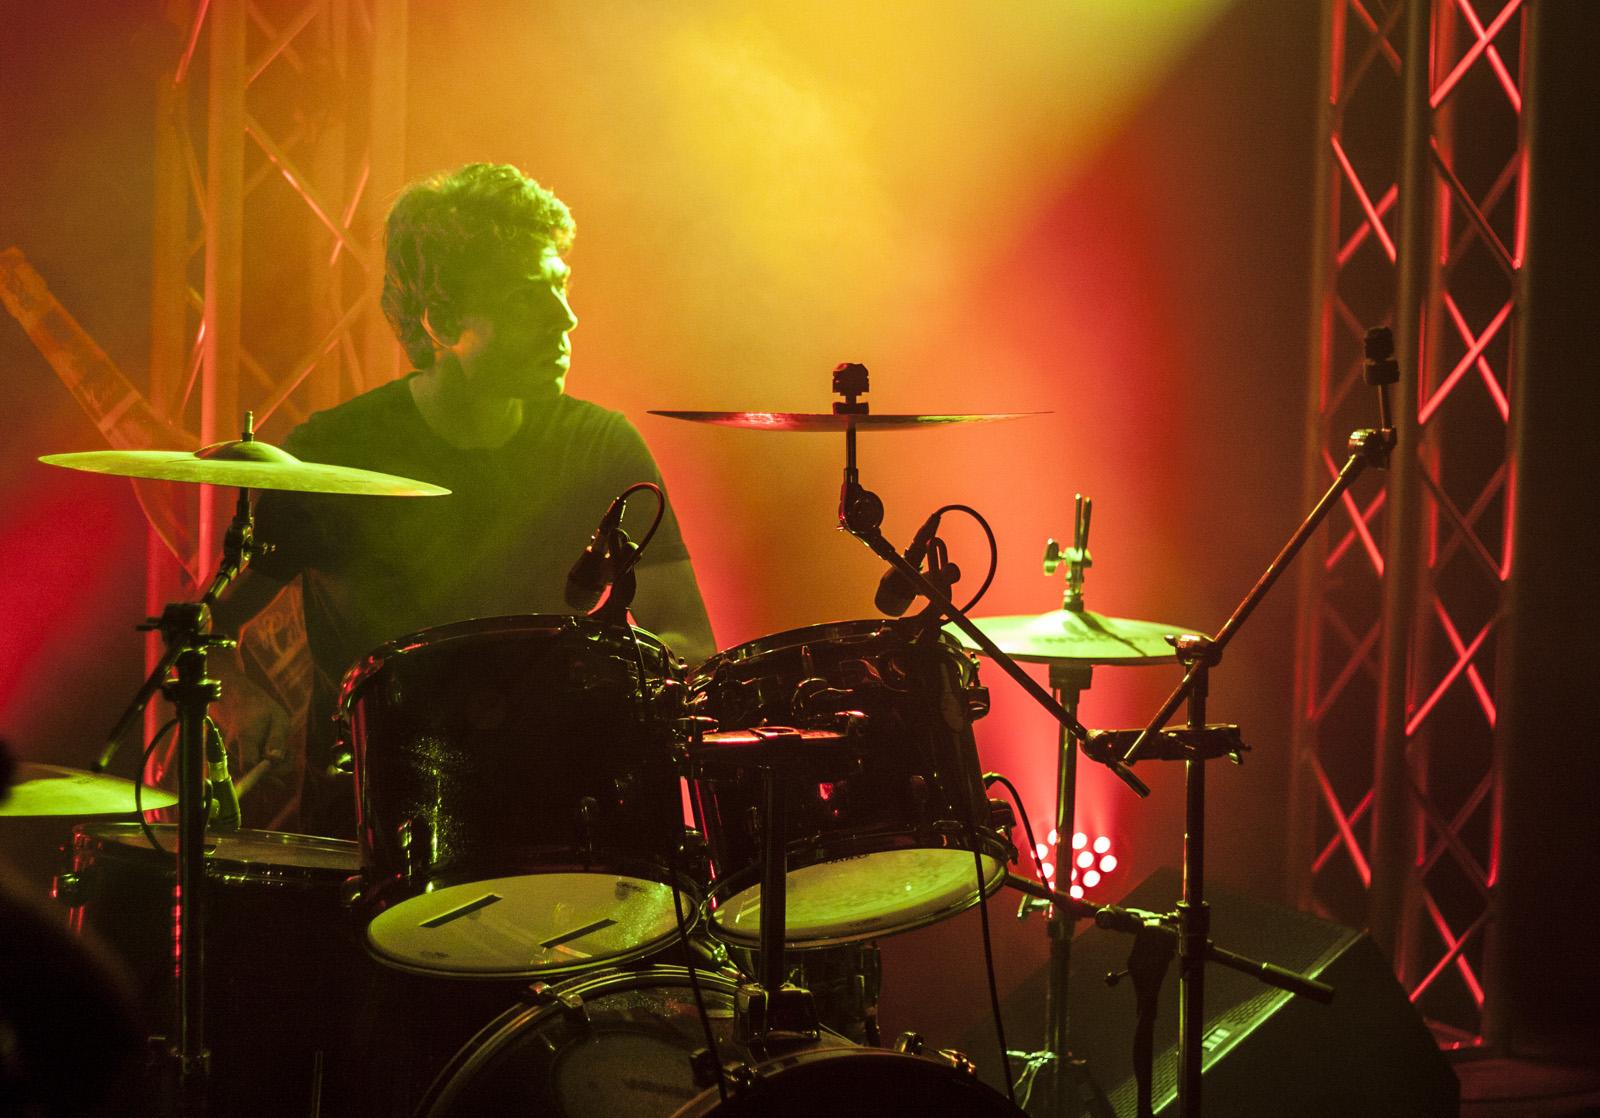 Drummer at live show